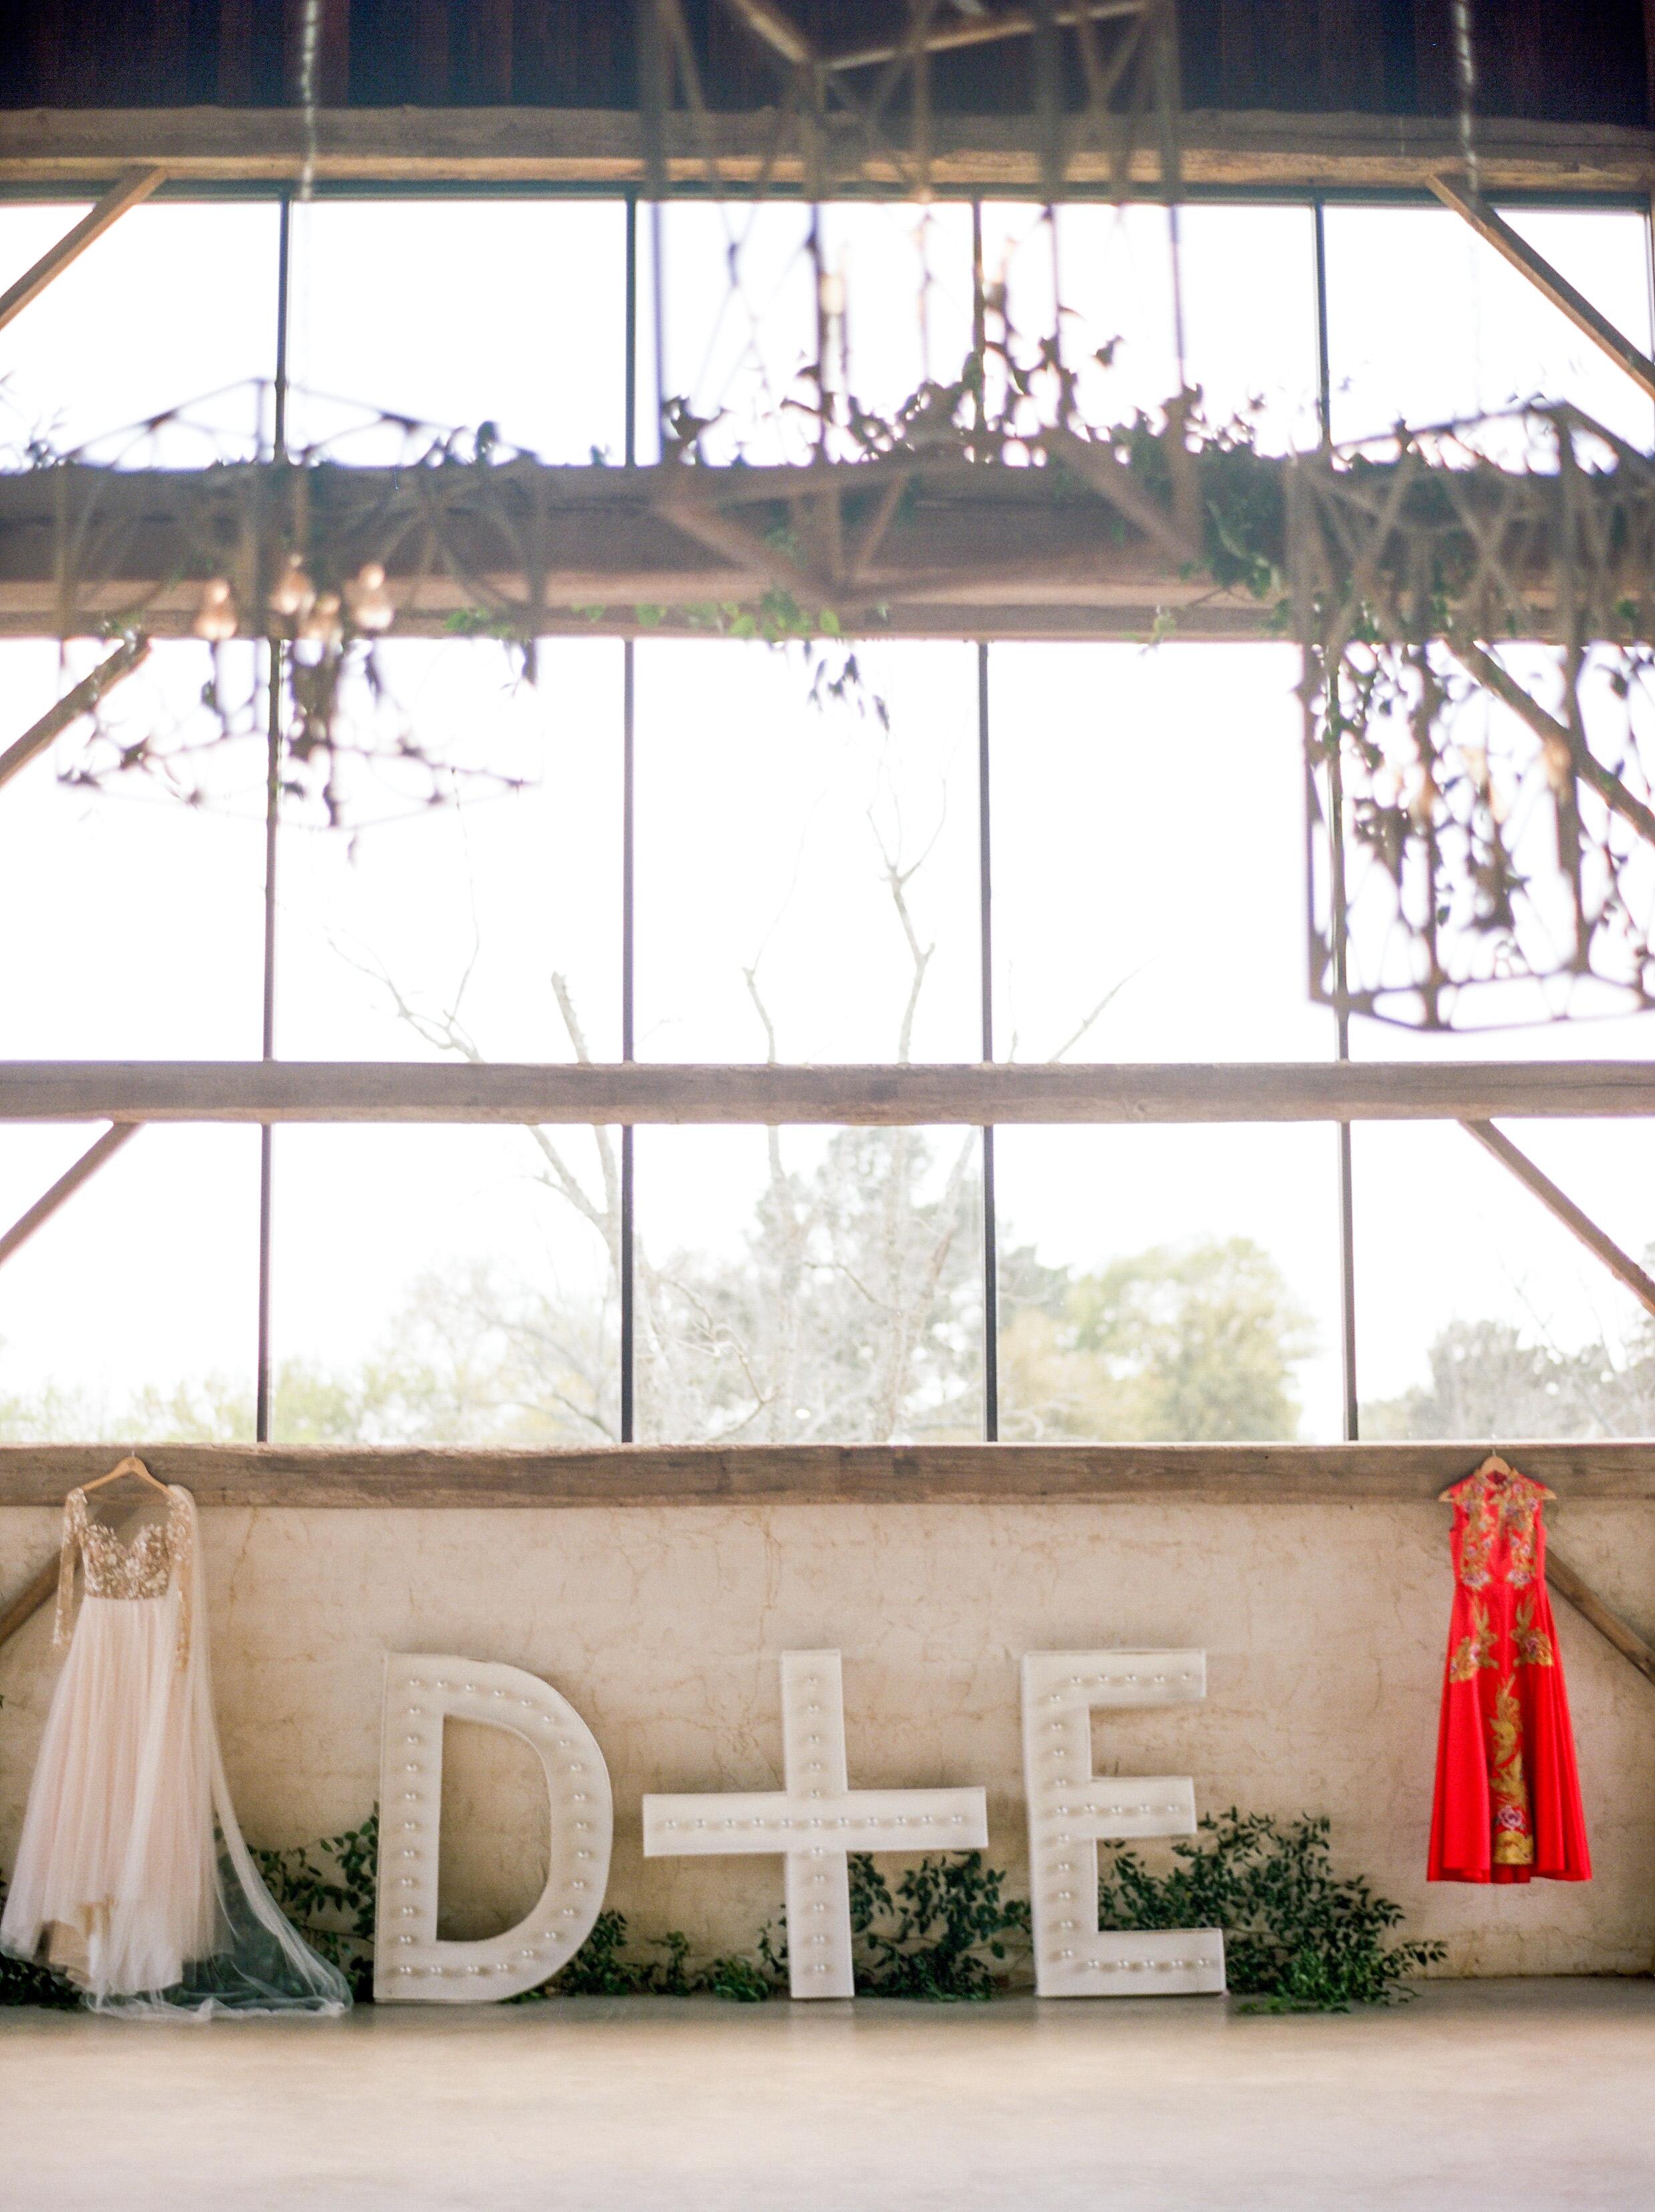 The-Knot-50-Weddings-50-States-Texas-Winner-Dana-Fernandez-photography-houston-wedding-photographer-film-fine-art-destination-6.jpg